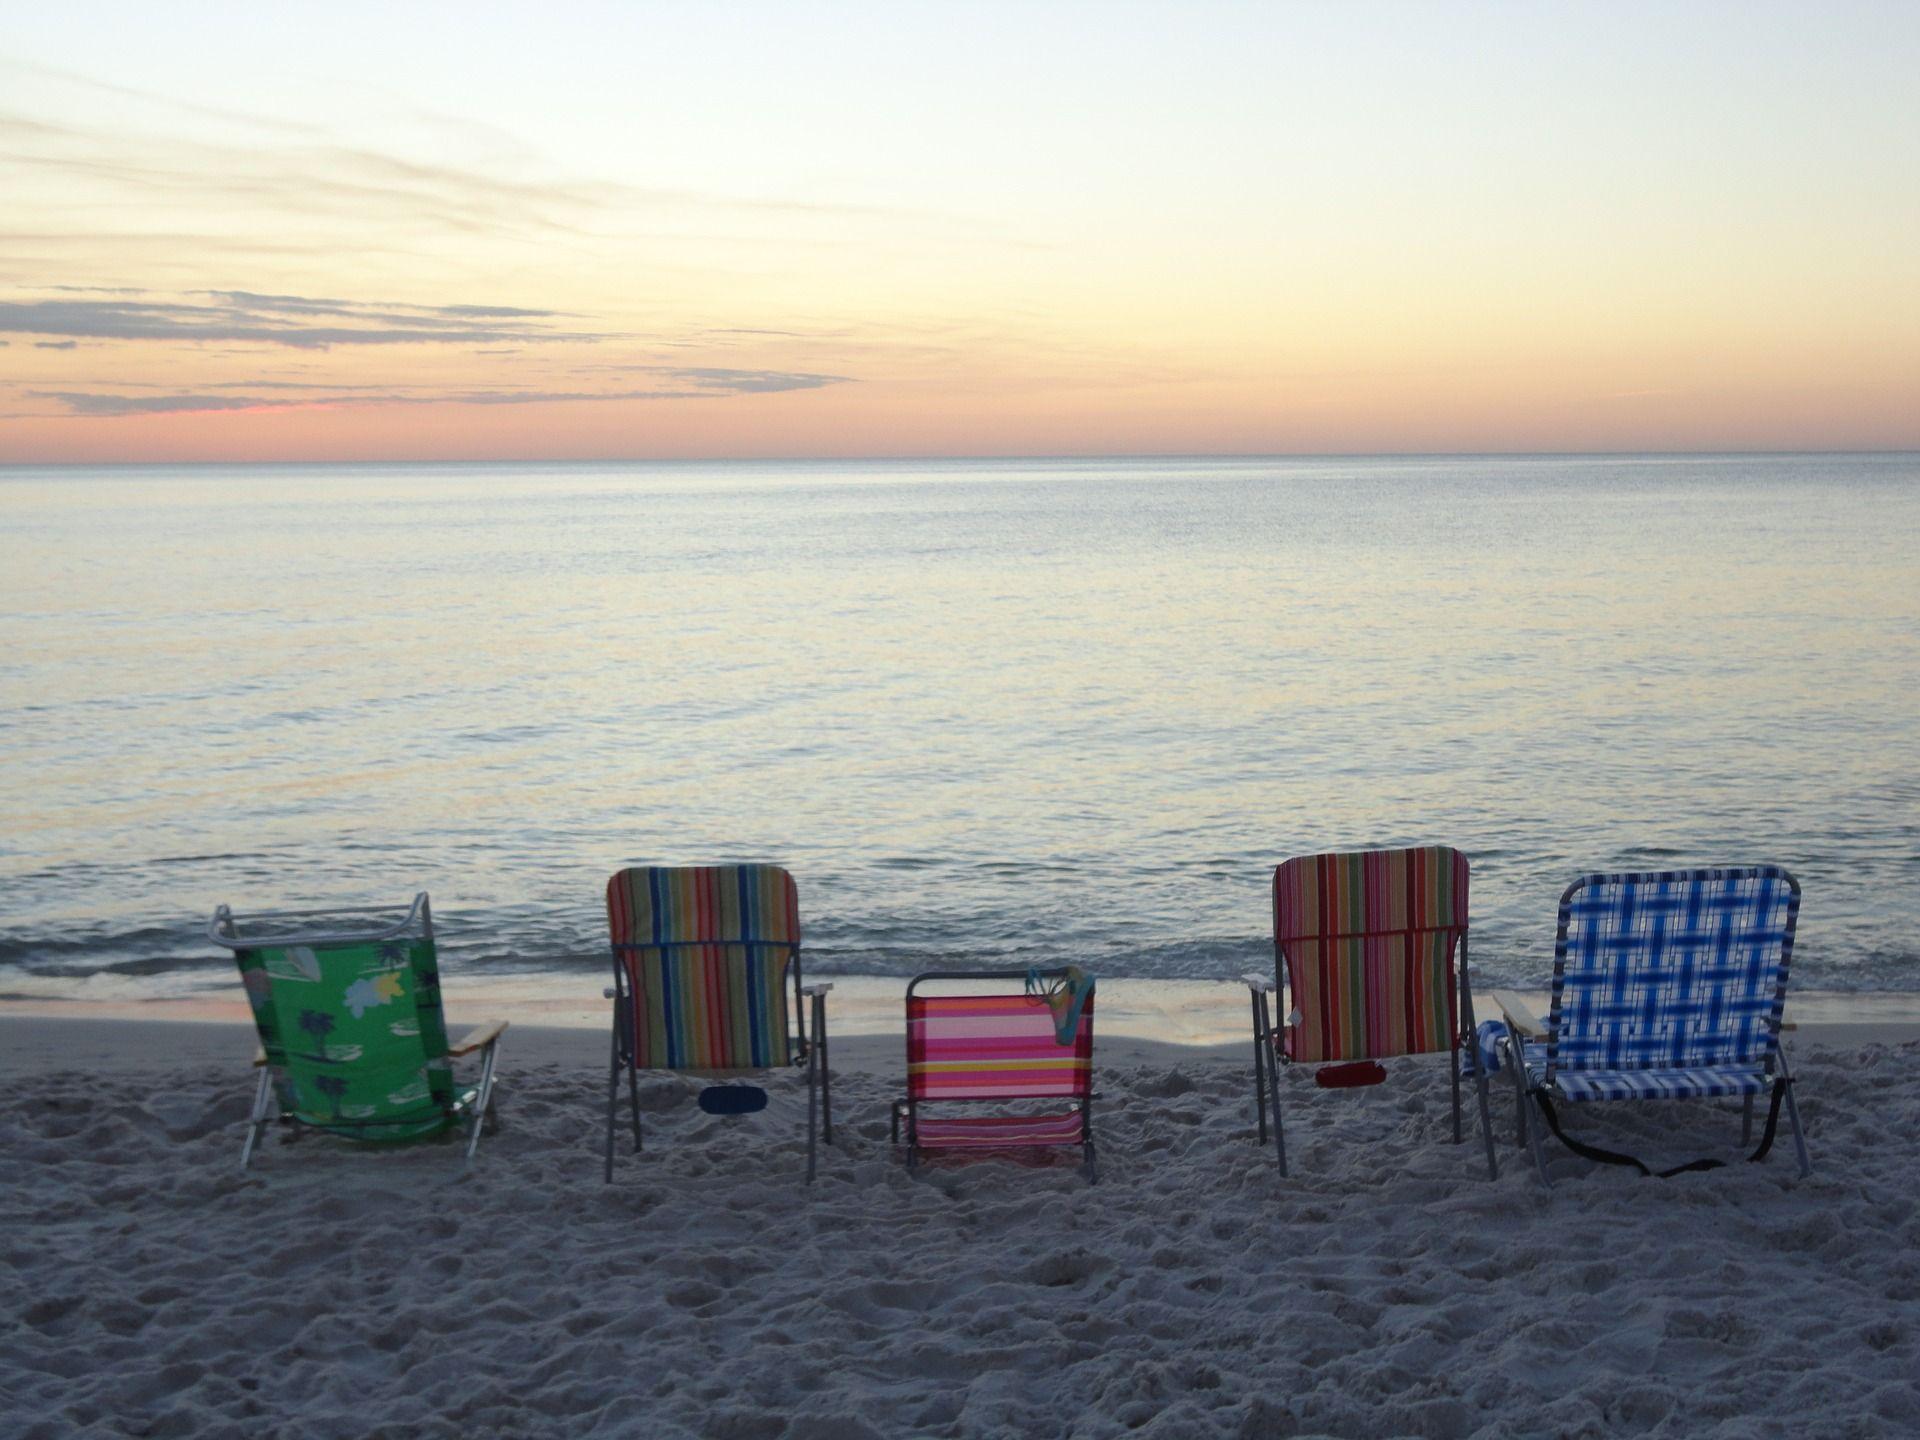 Naples Beach in Florida